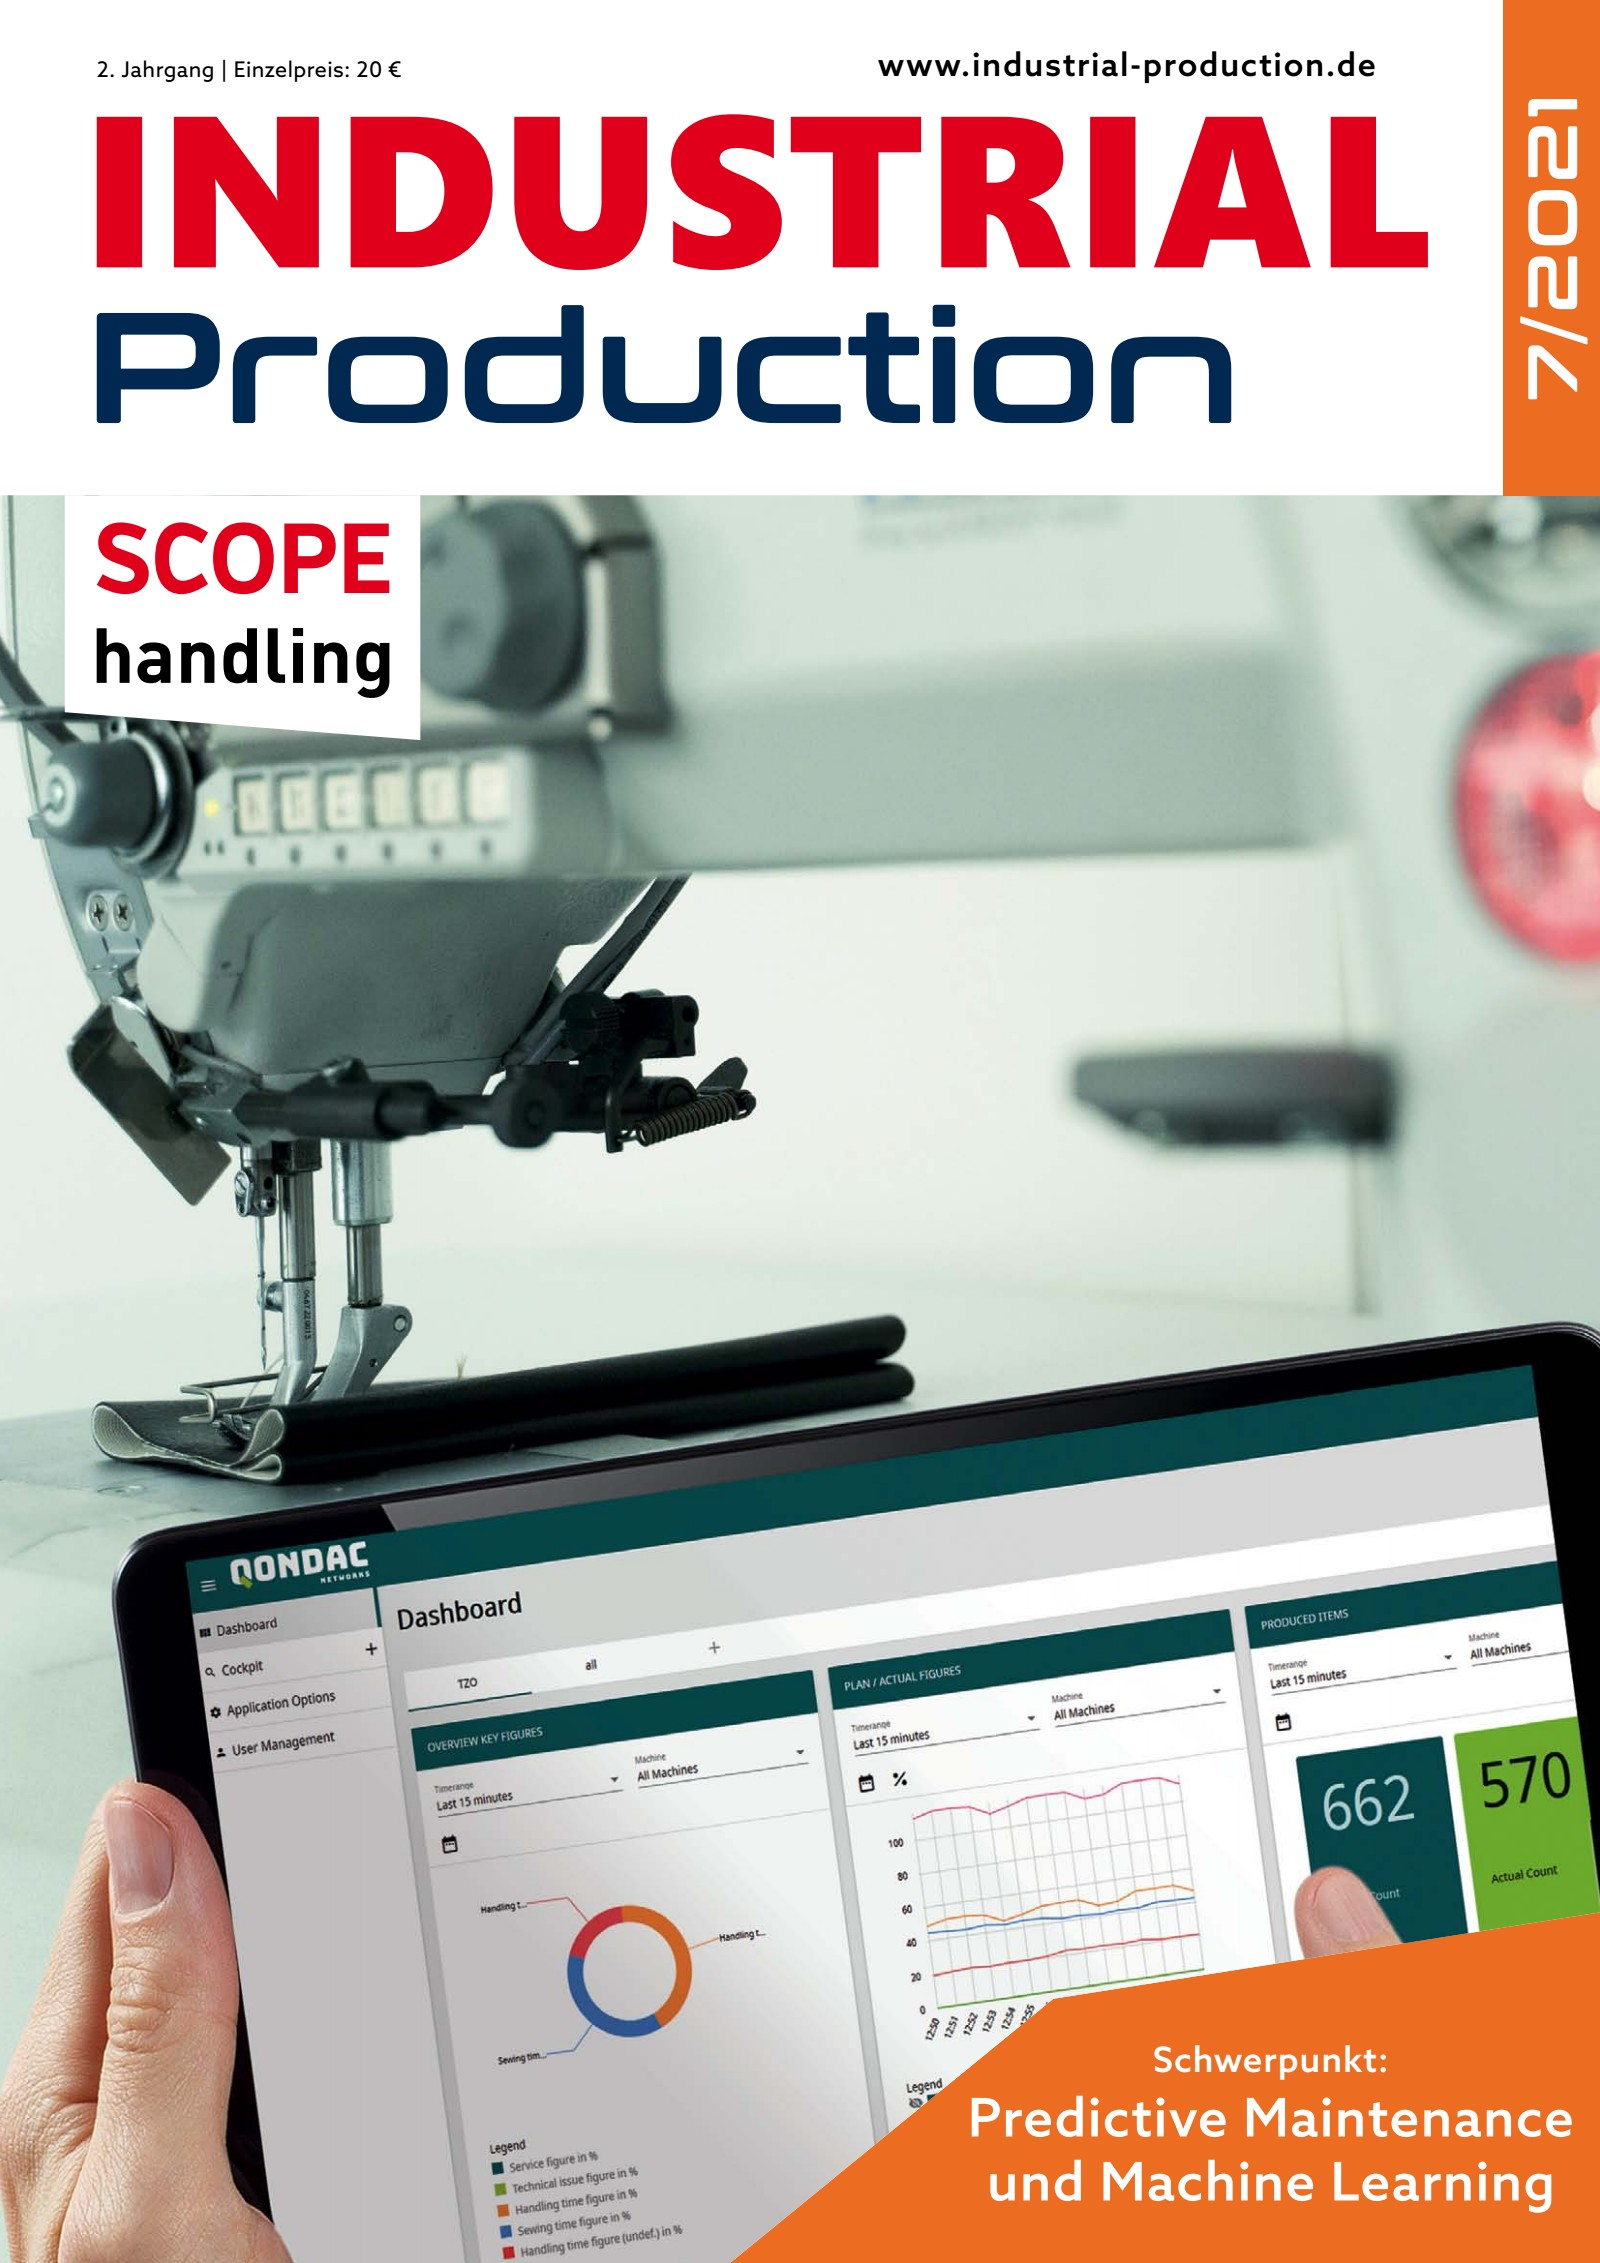 INDUSTRIAL Production 07/2021 Digital